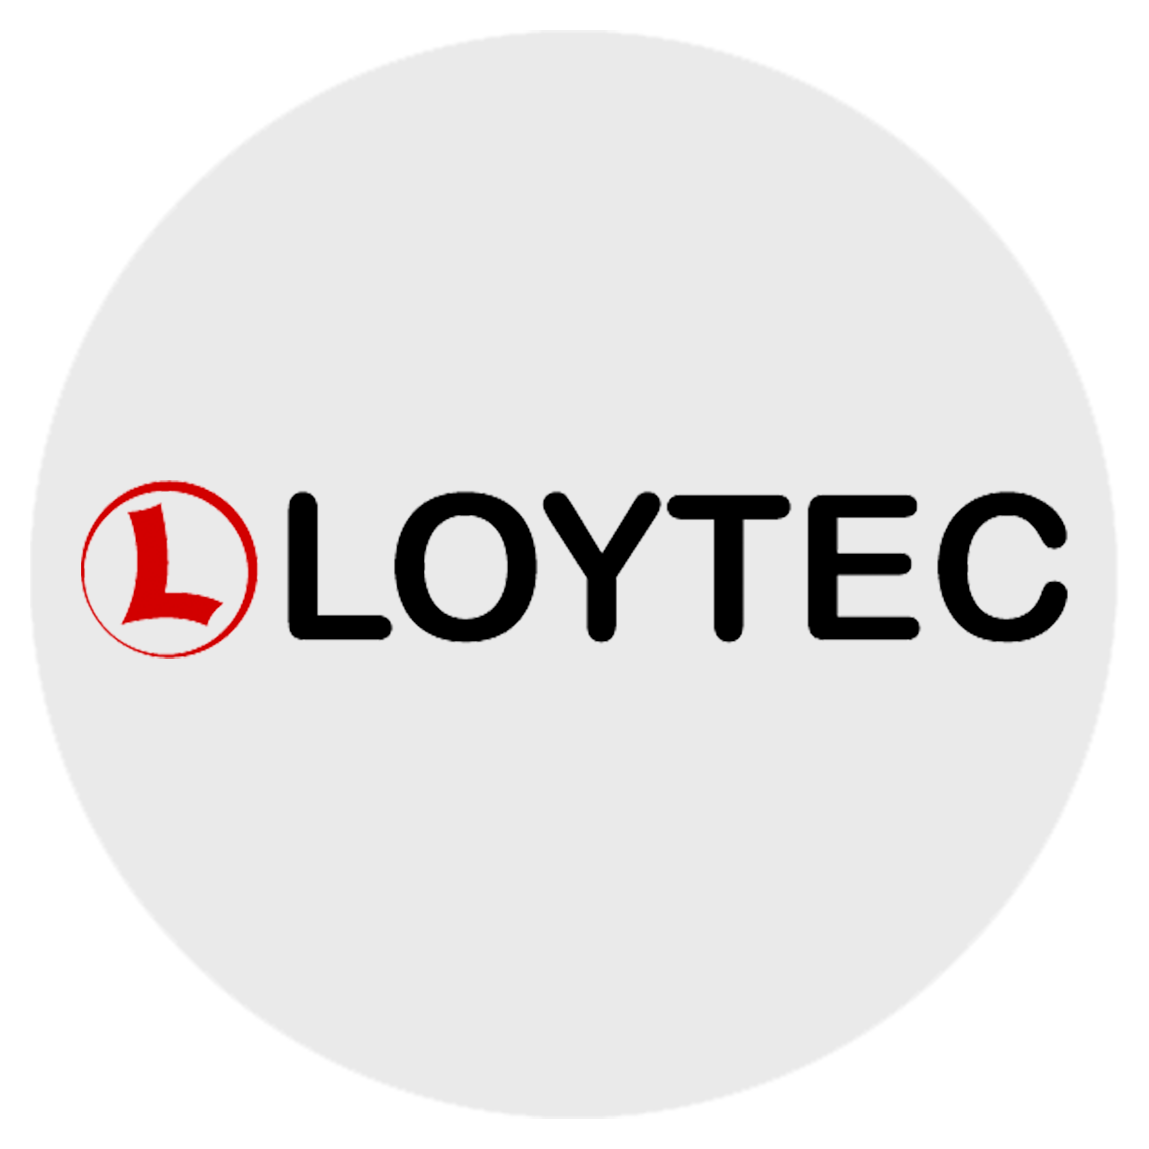 http://walterscontrols.net/wp-content/uploads/2020/01/loytec.png